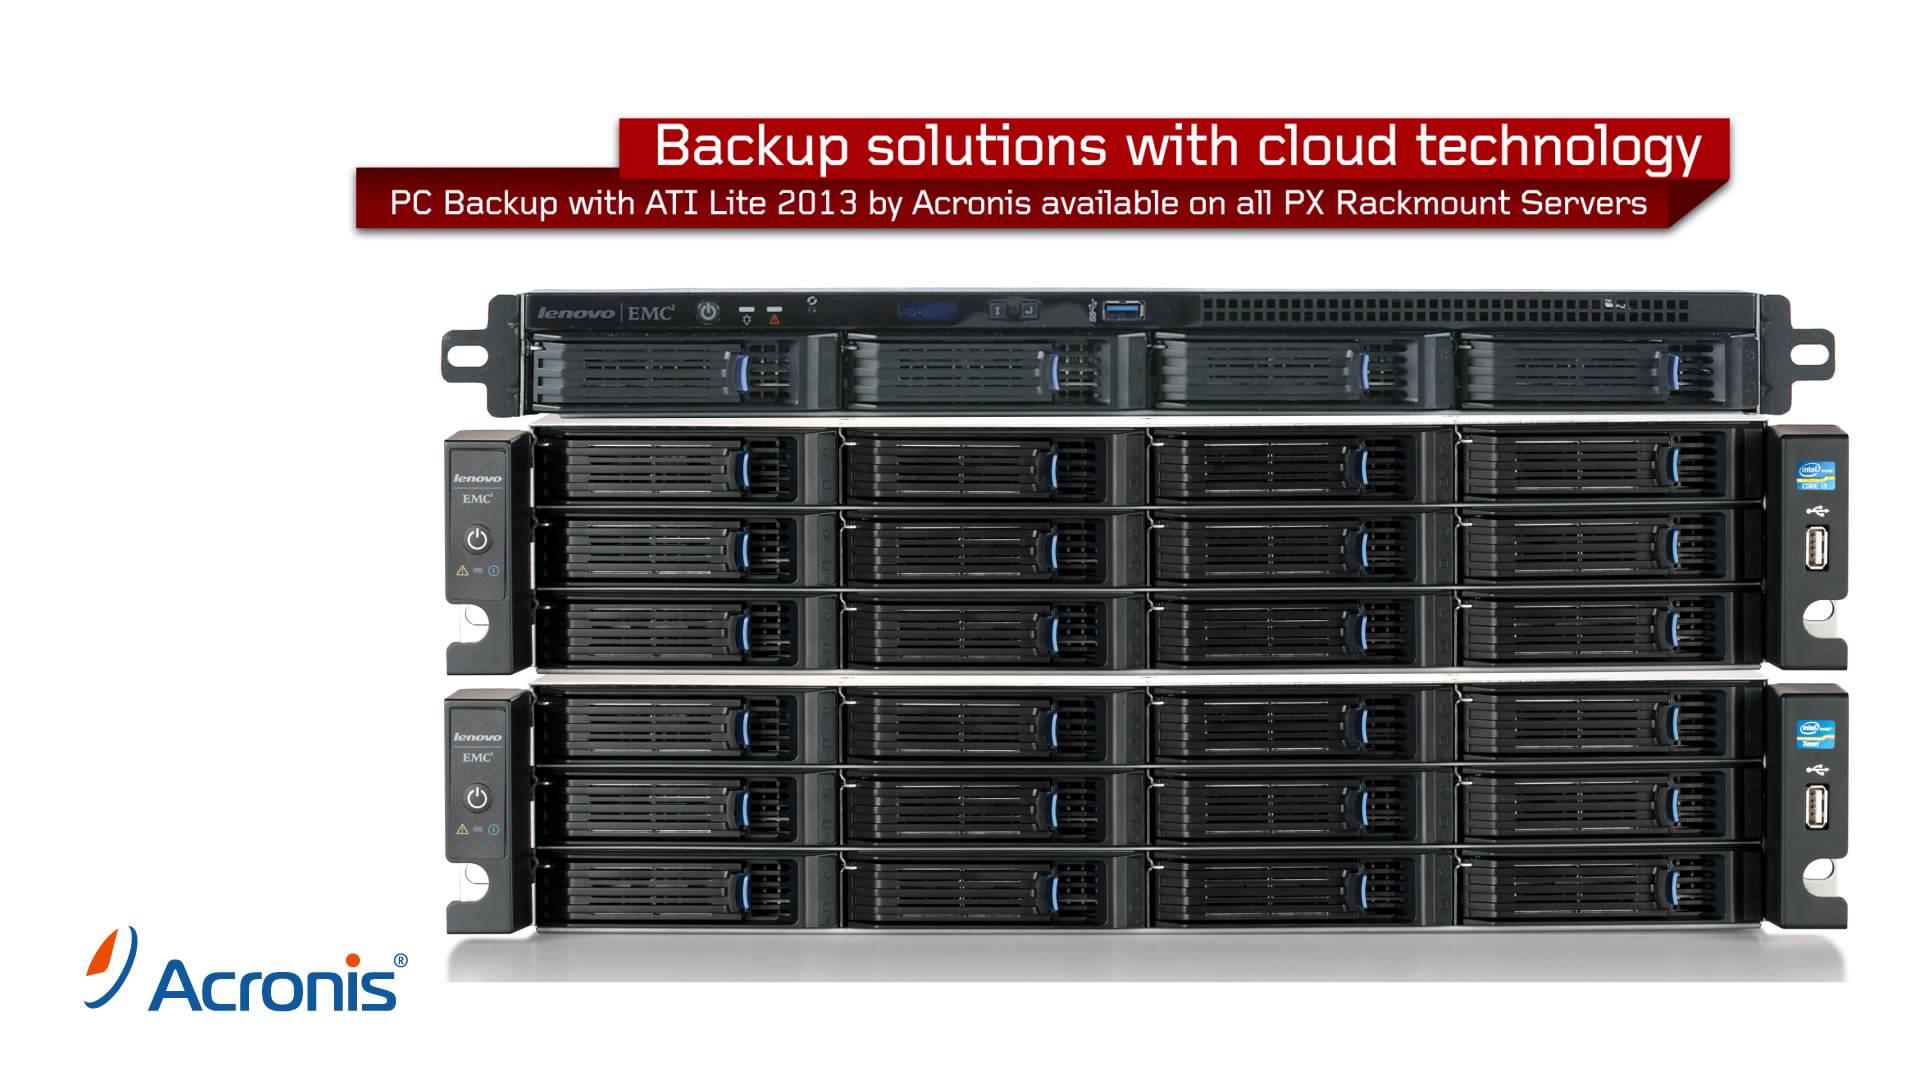 LenovoEMC Network Storage Rackmount Family